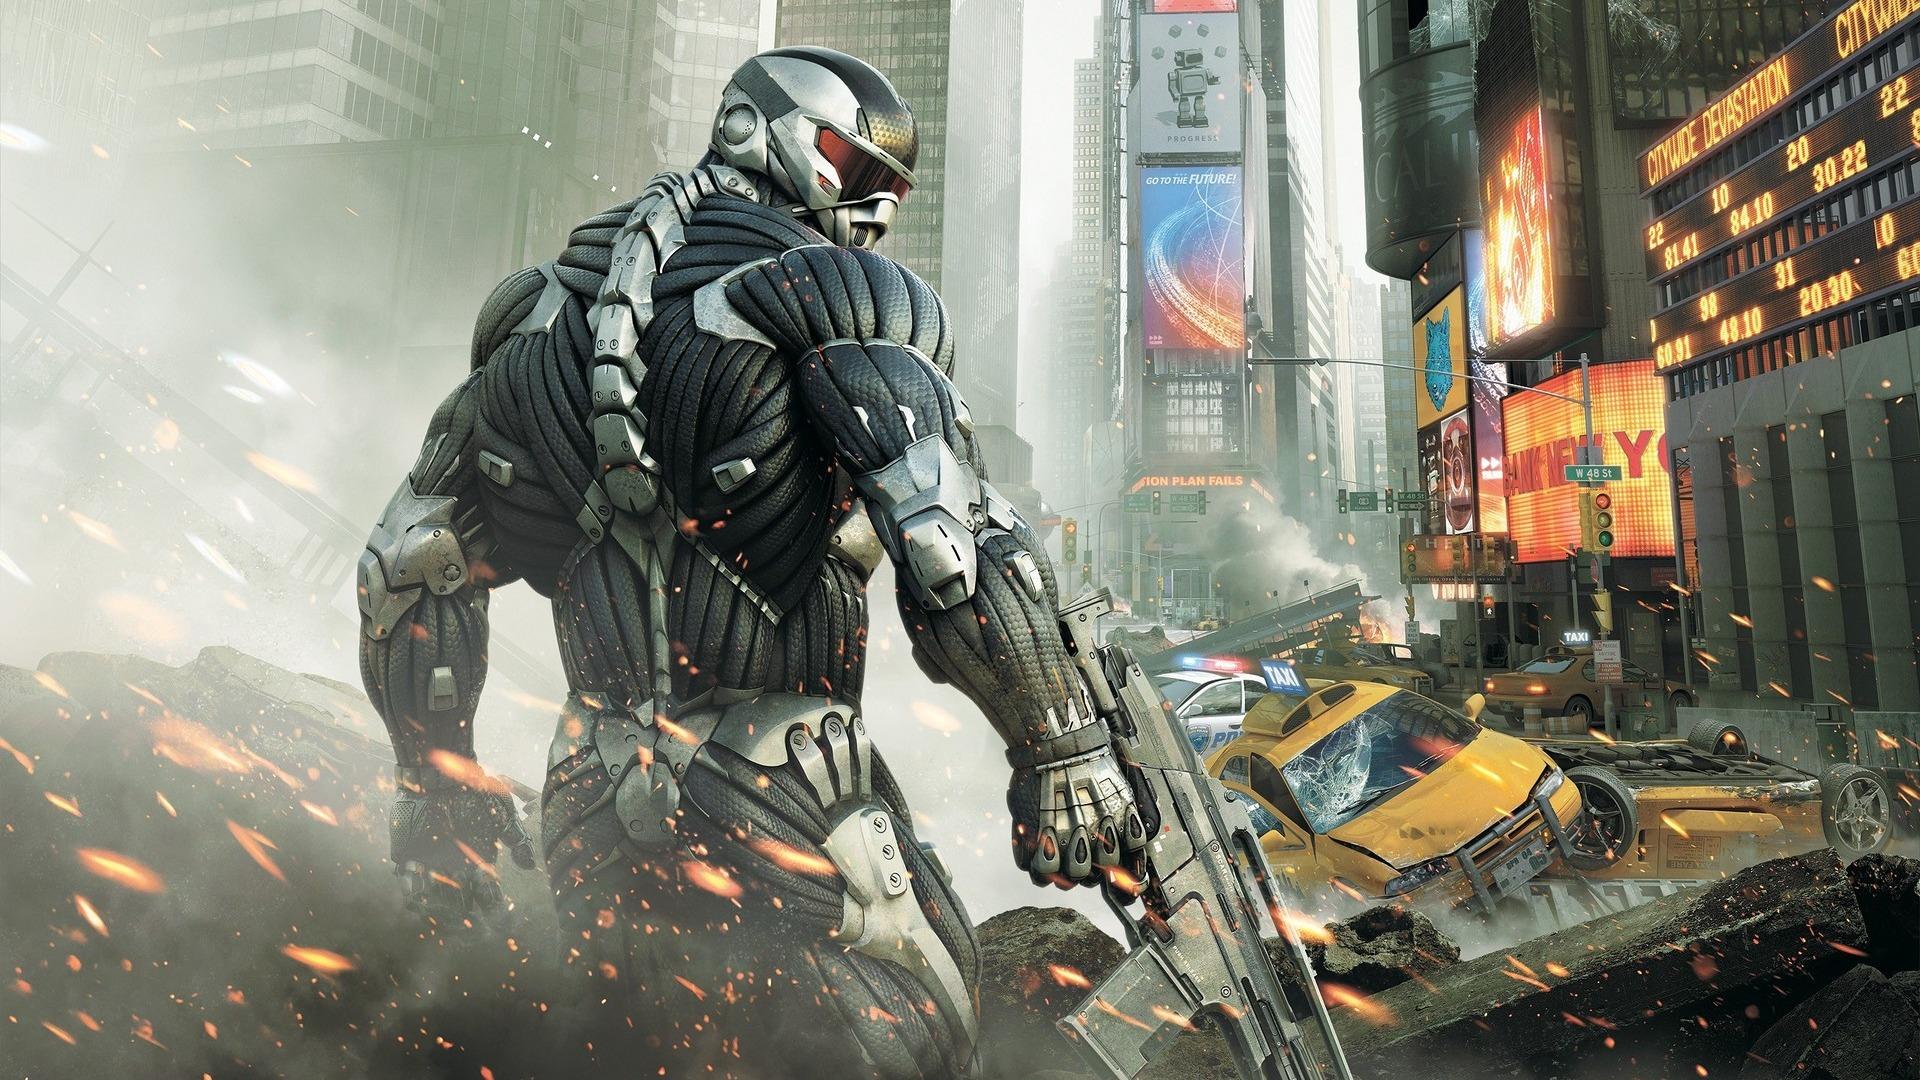 Crysis full game free pc, download, play. Crysis download torrent | suretorrentgames1q